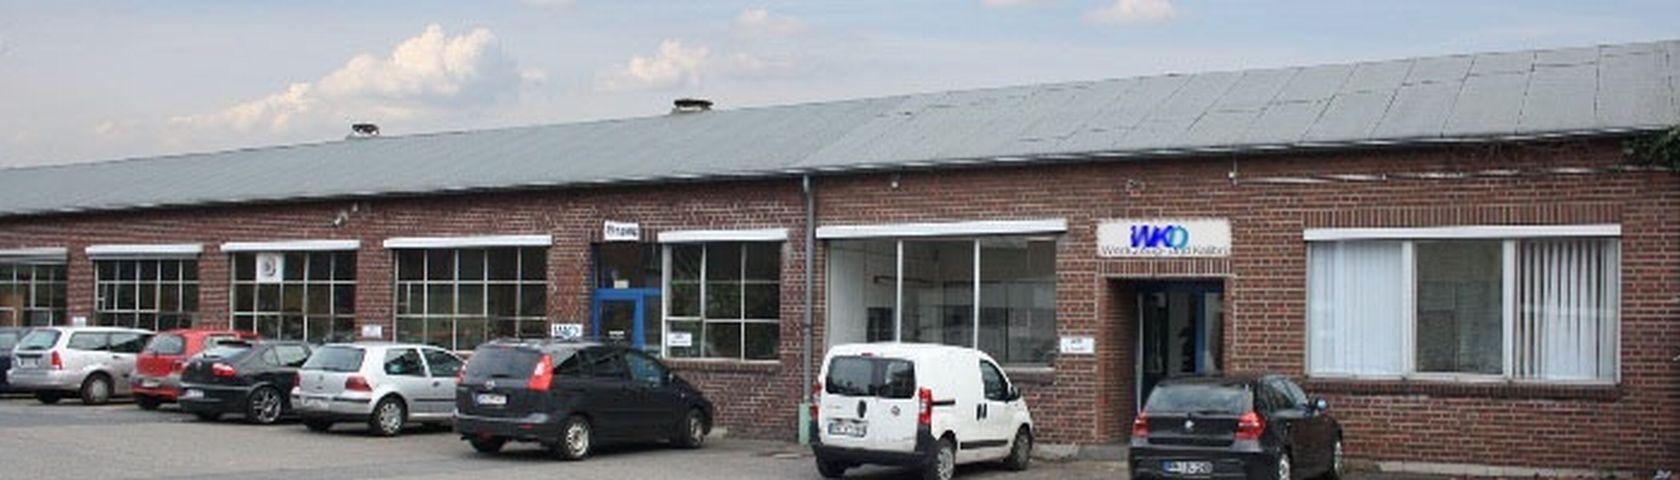 WKD GmbH